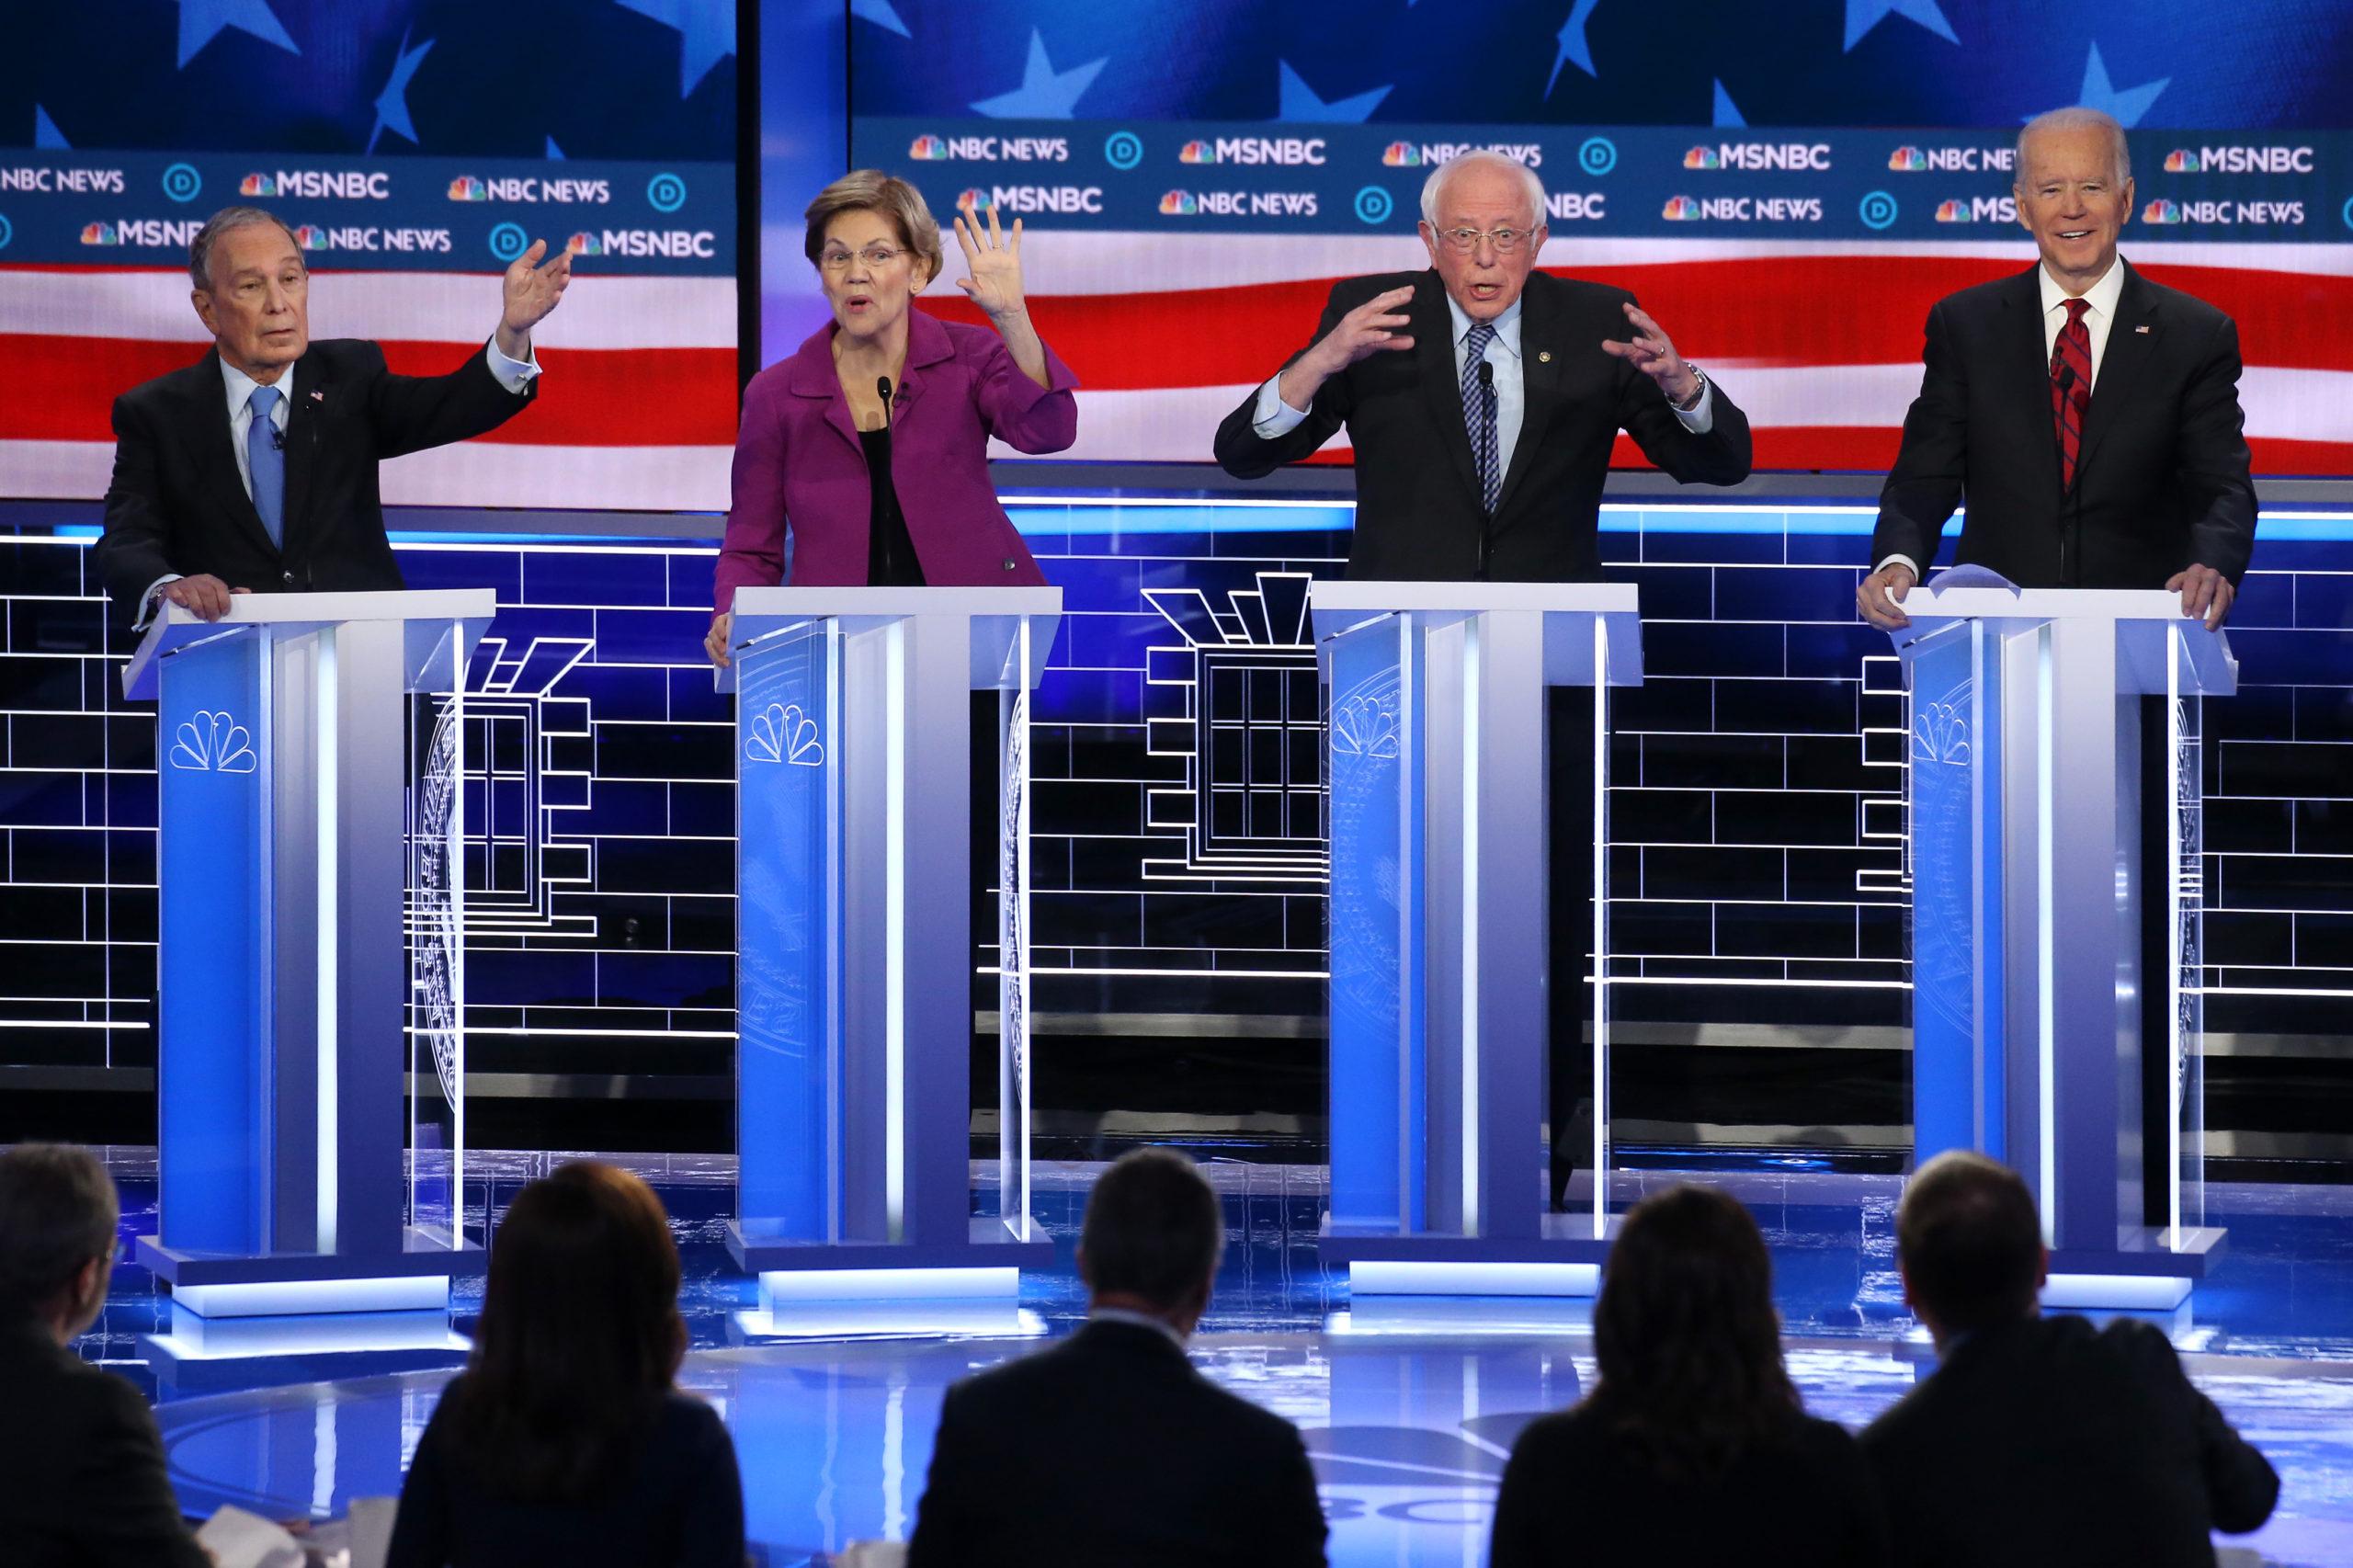 Who Won Democratic Debate In Las Vegas On Msnbc